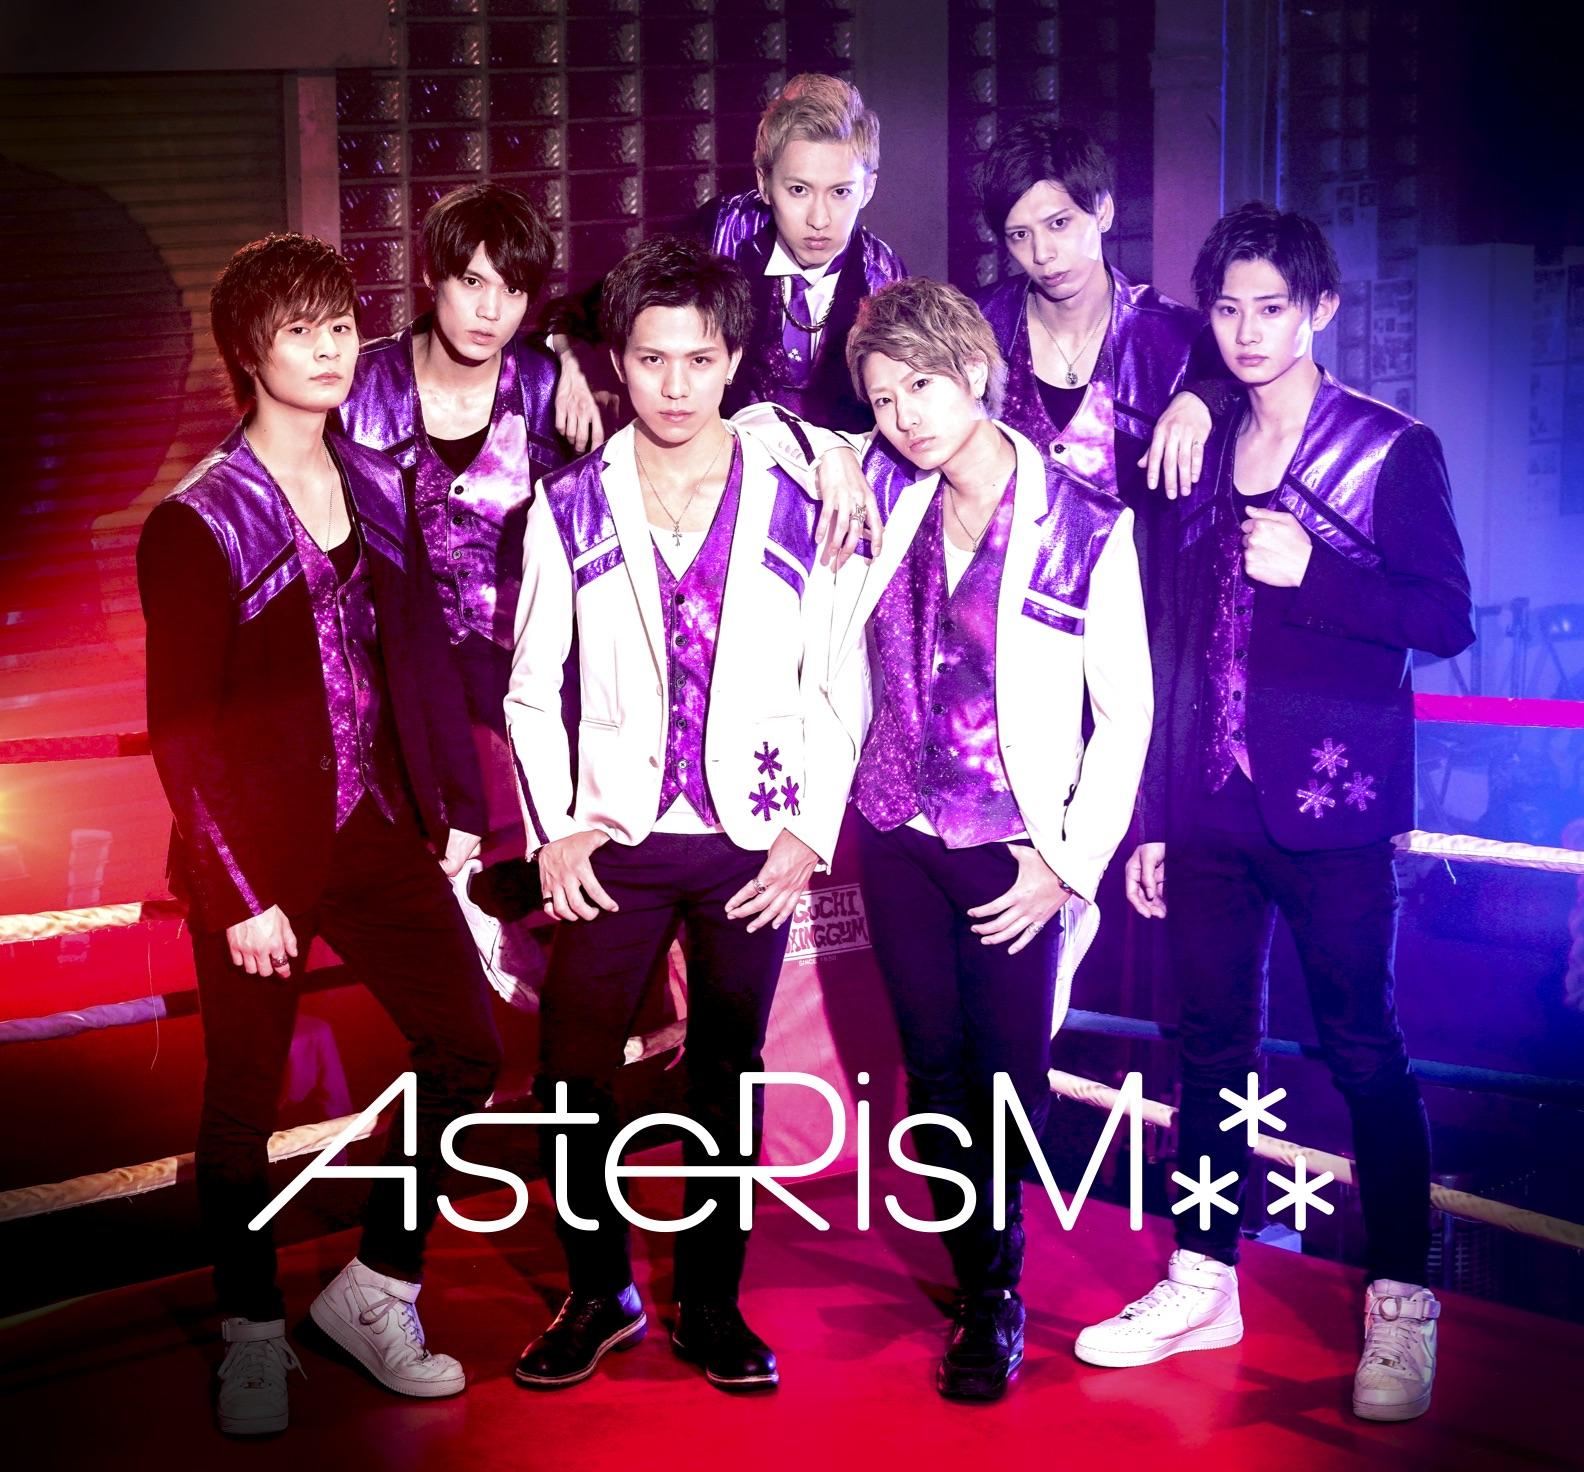 6/1 AsteRisM⁂1stシングル 発売記念ワンマンライブ